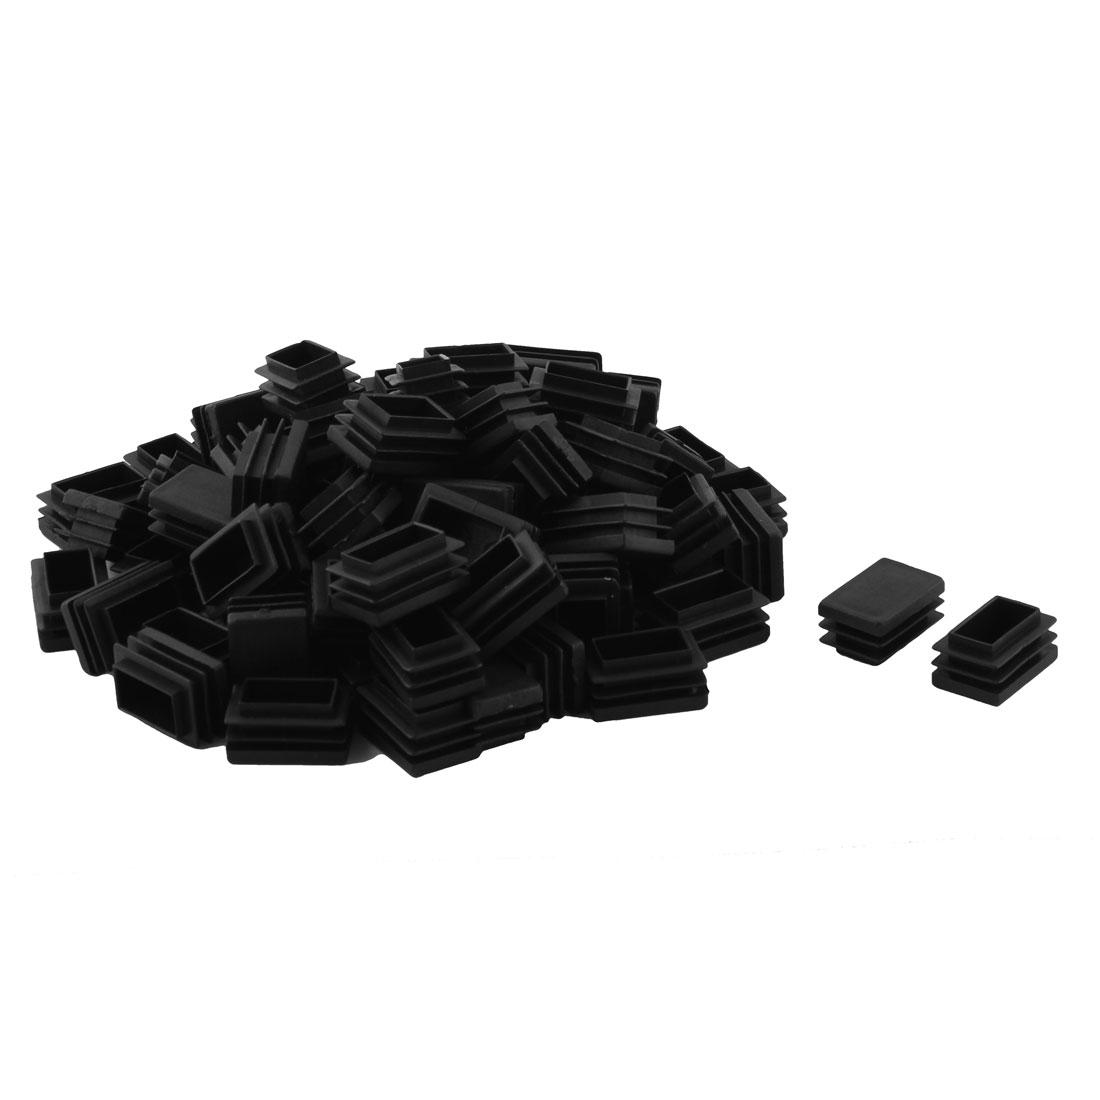 Plastic Rectangle Design Tube Insert End Cover Cap Black 20 x 30mm 80pcs